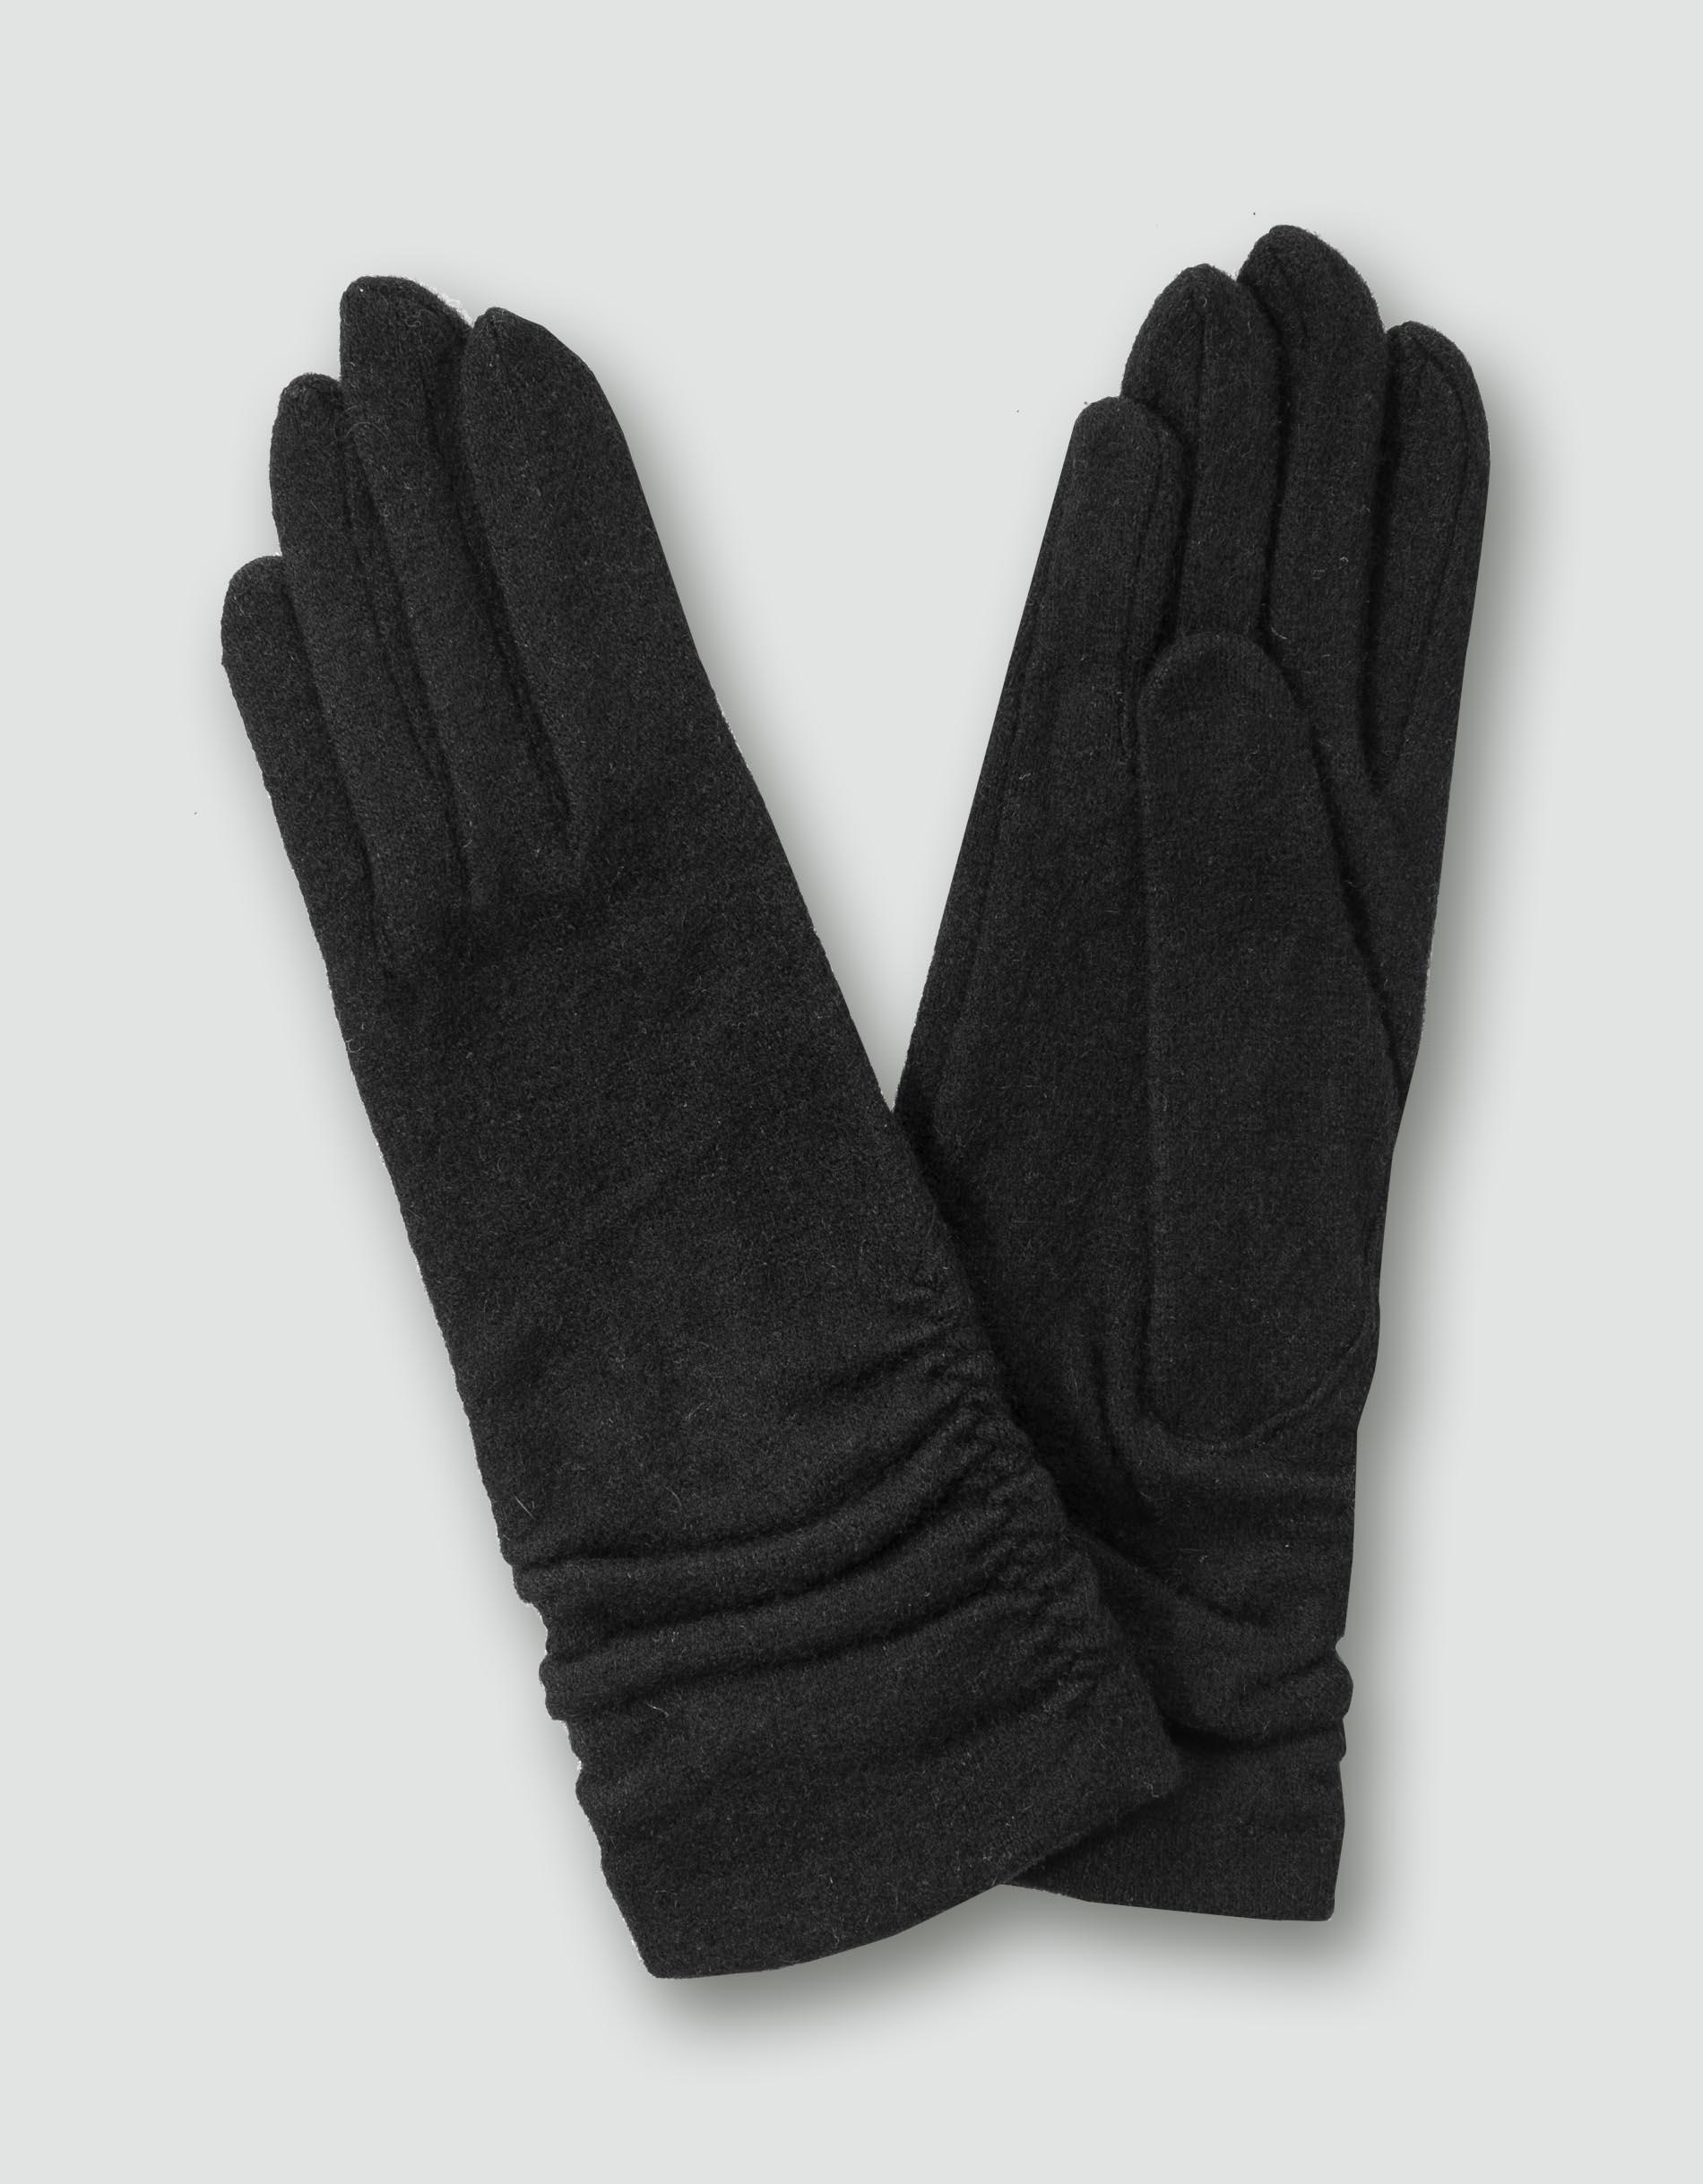 roeckl damen handschuhe in leicht gewalkter optik. Black Bedroom Furniture Sets. Home Design Ideas